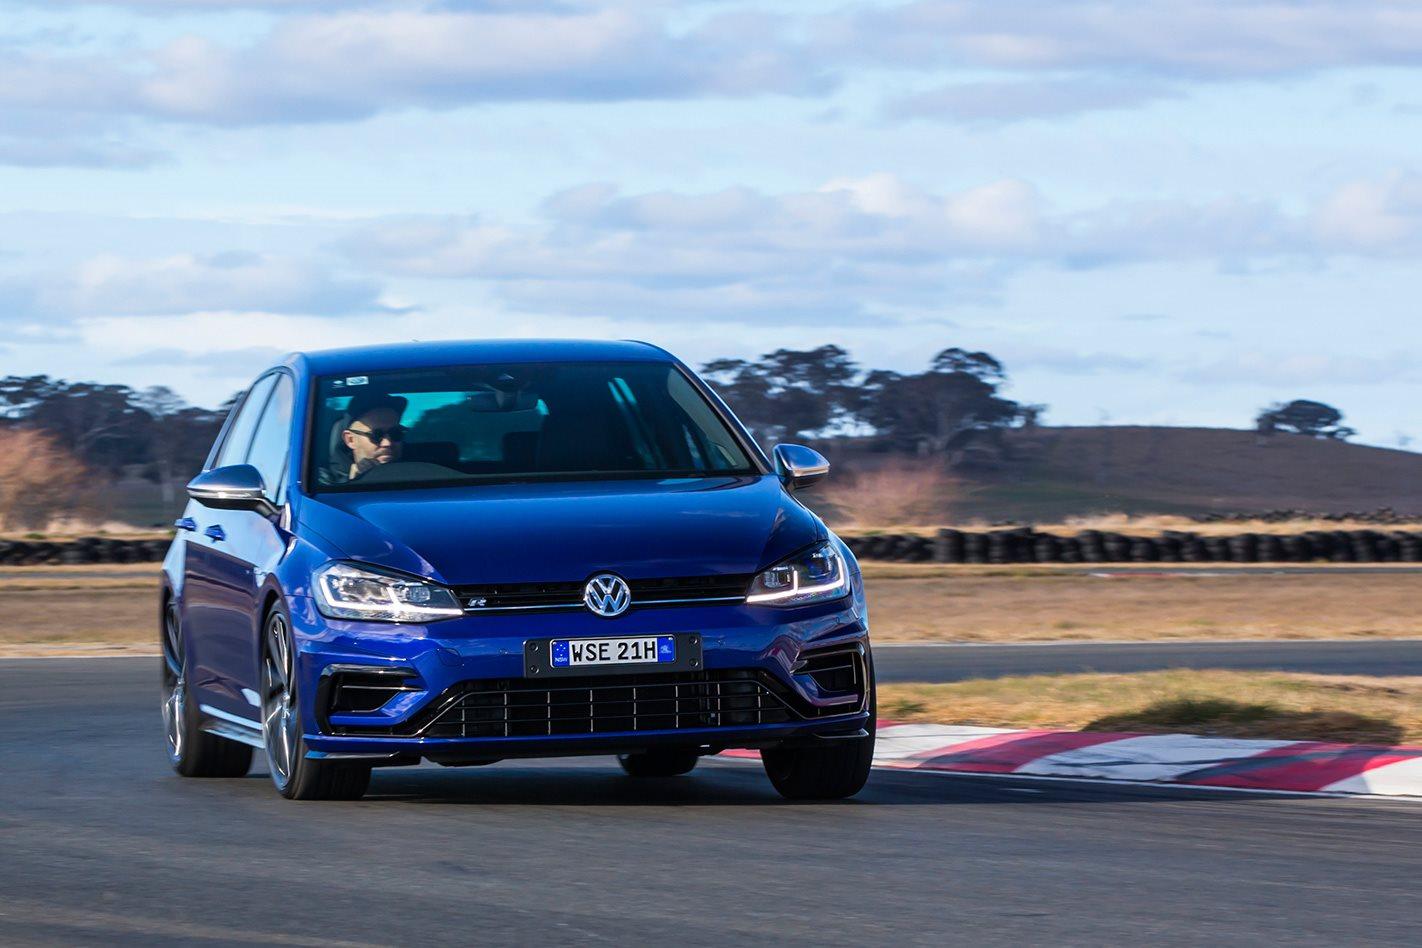 2017 Volkswagen Golf R 7.5 turning.jpg